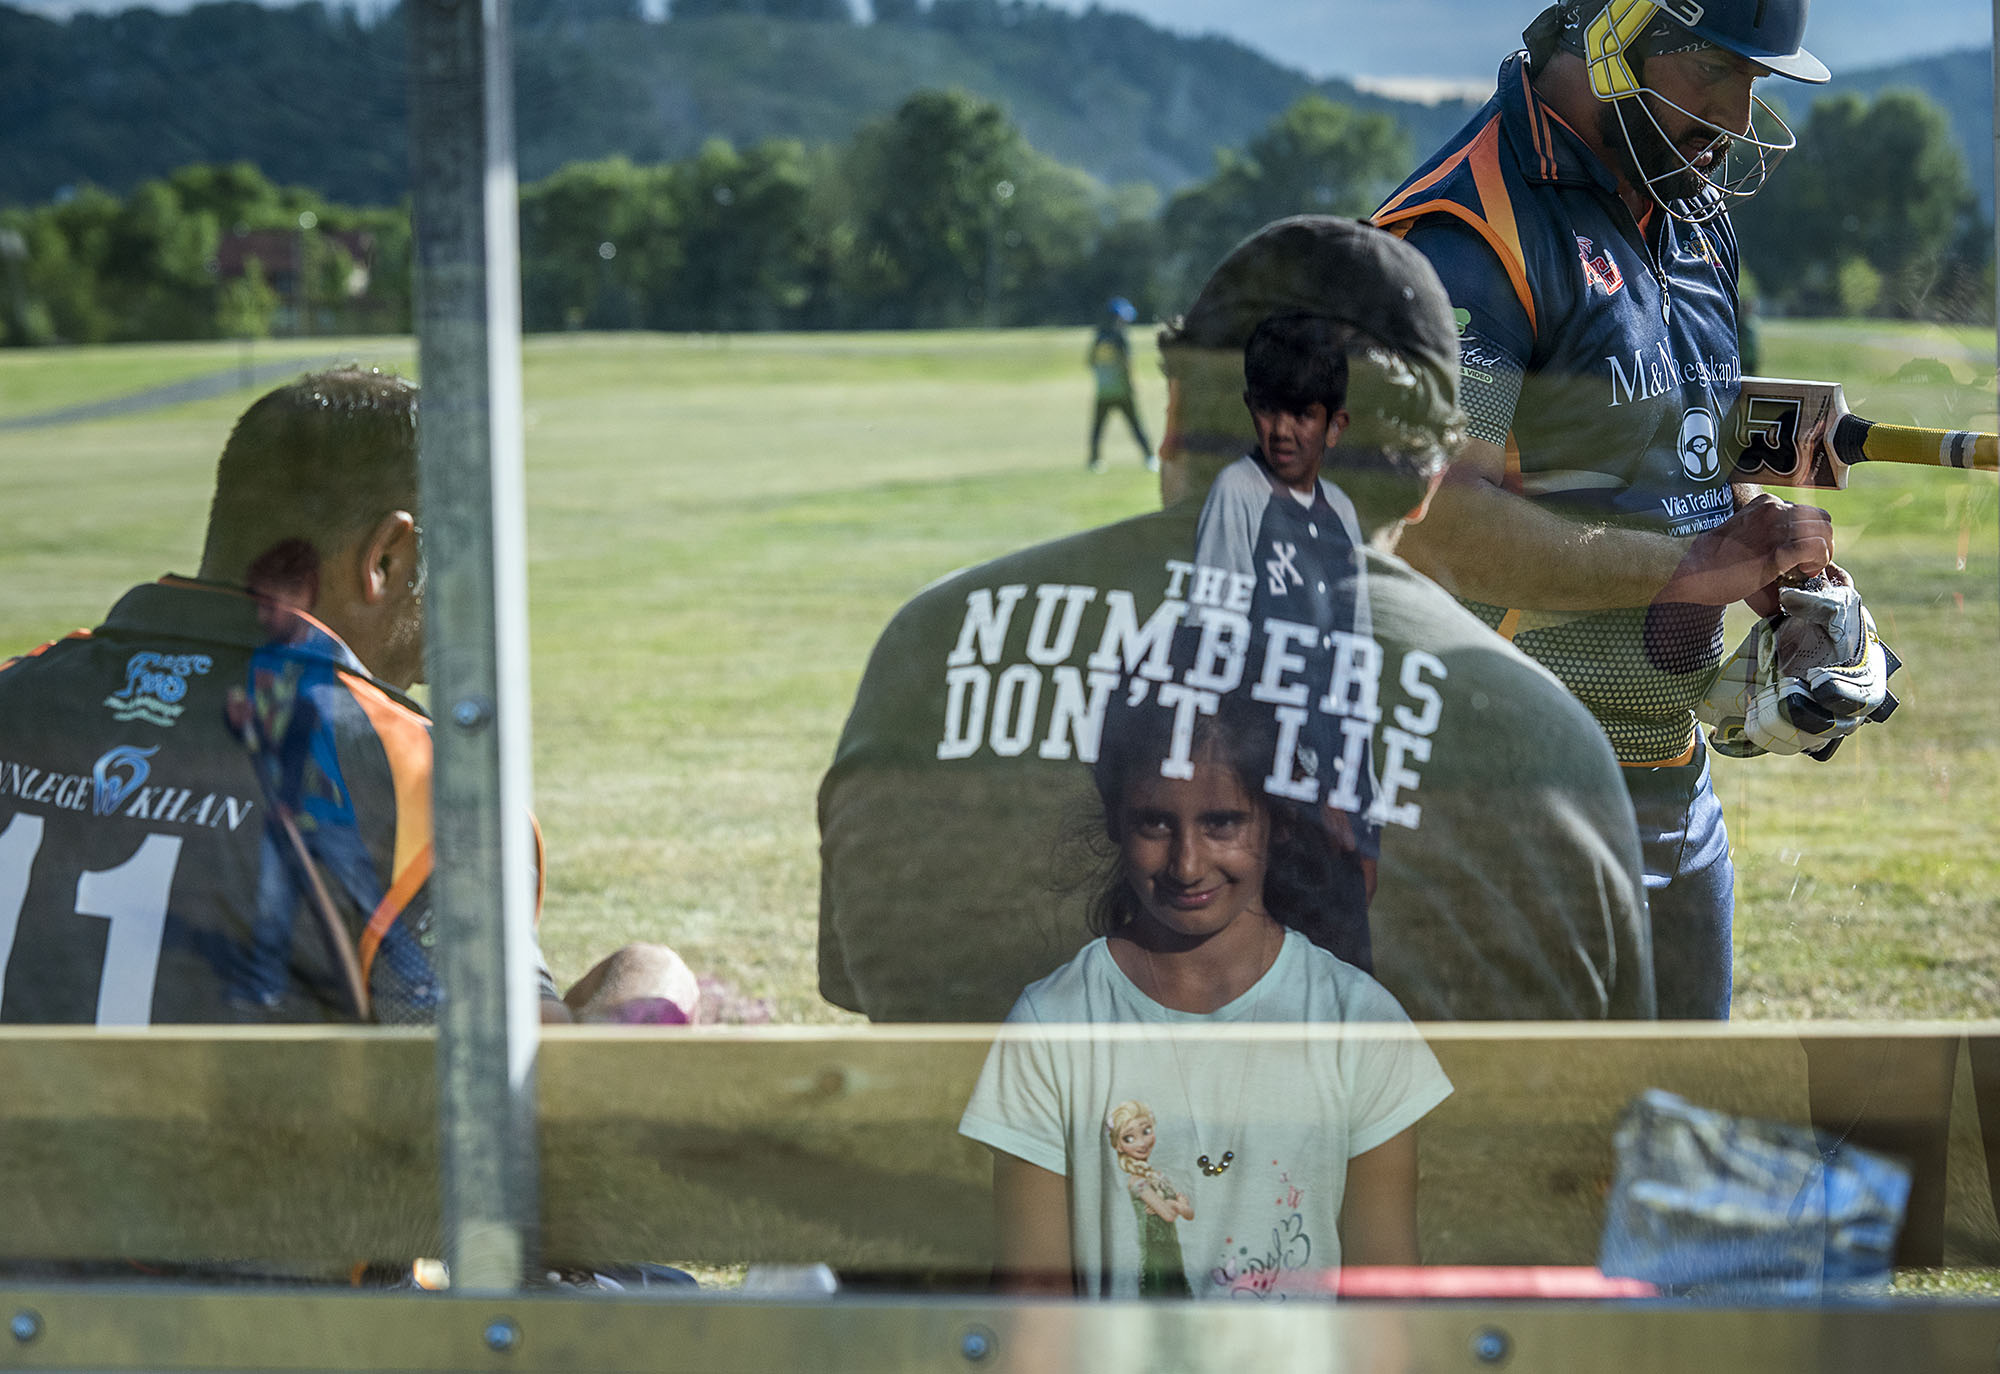 Cicander_11305_25.07.17_CricketRudsletta.jpg